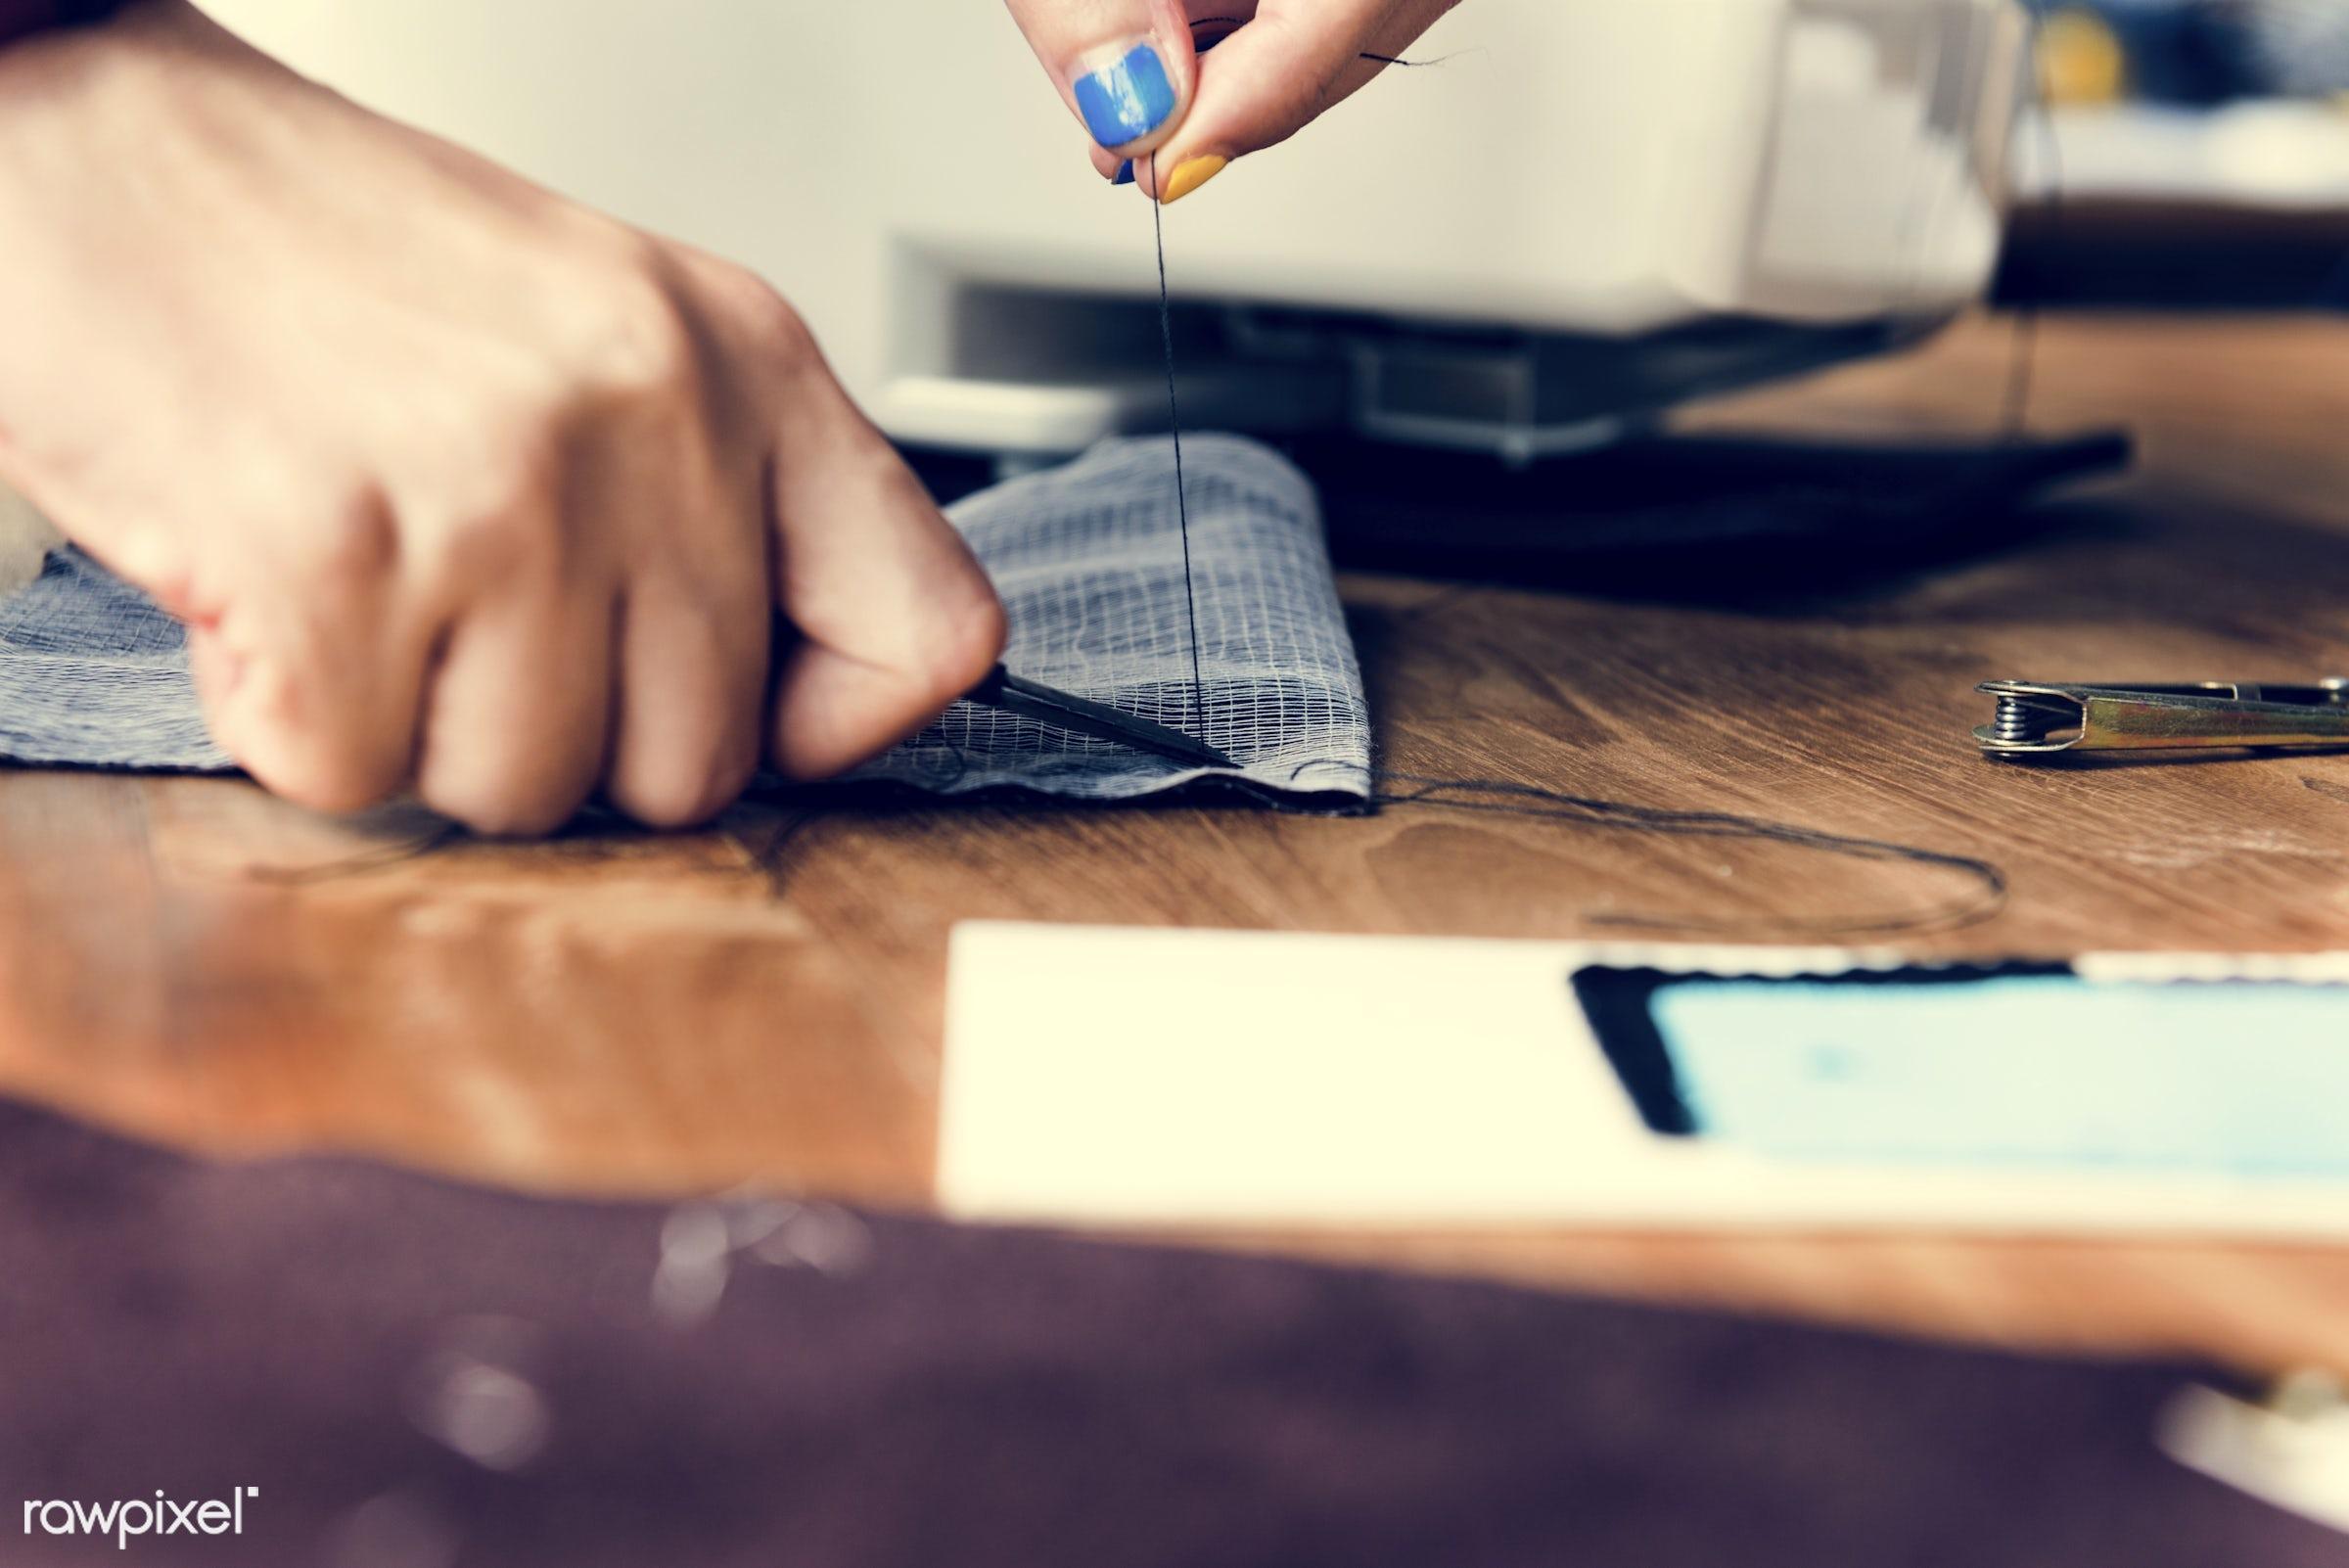 trends, sew, fashion, detail, craft, clothing, garment, fashion studio, profession, tool, equipment, perfection, inspiration...